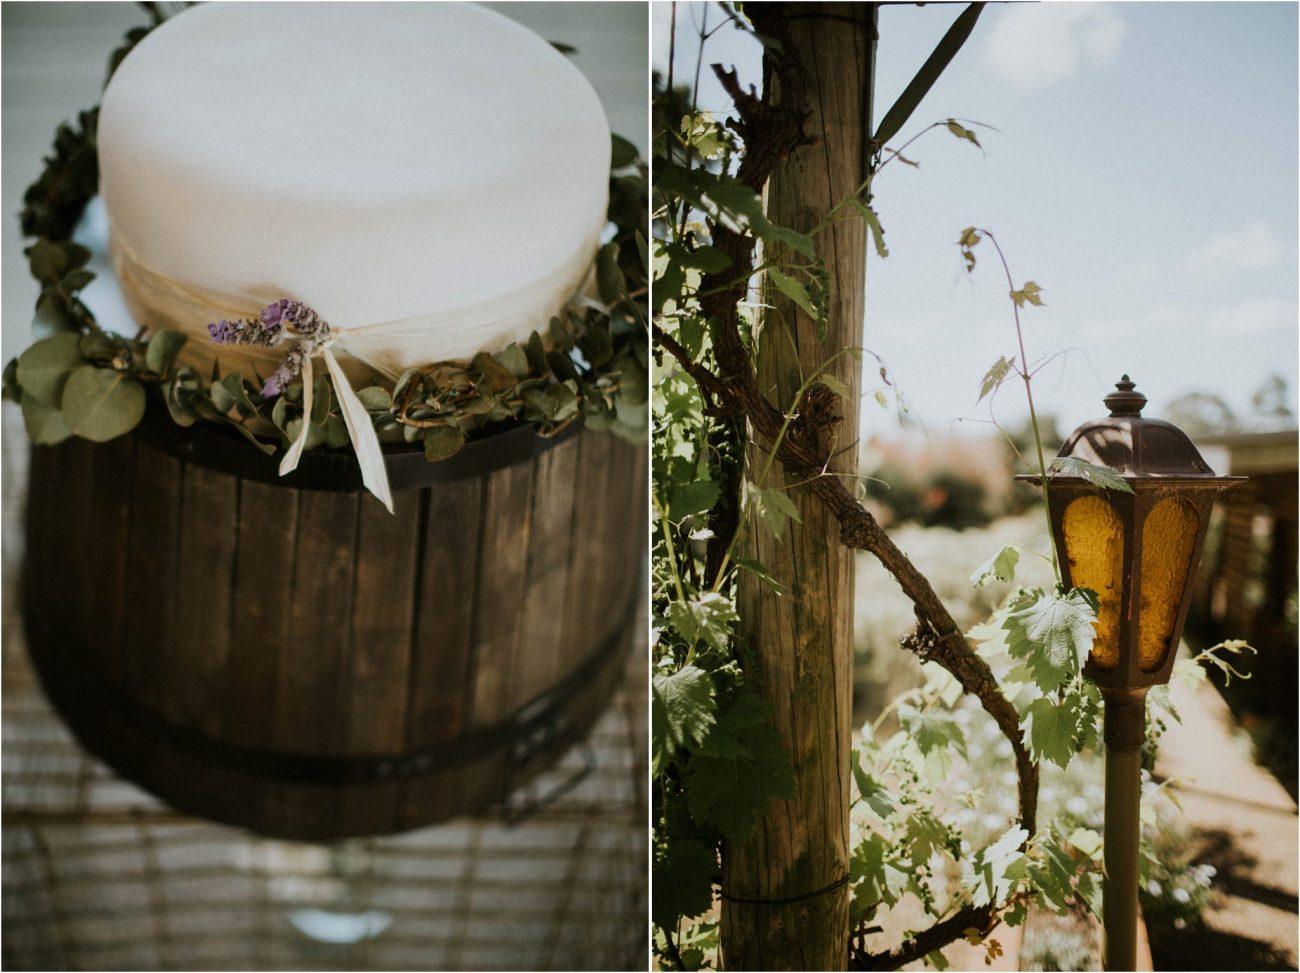 hunter-valley-wedding-photographer-joshua-mikhaiel739